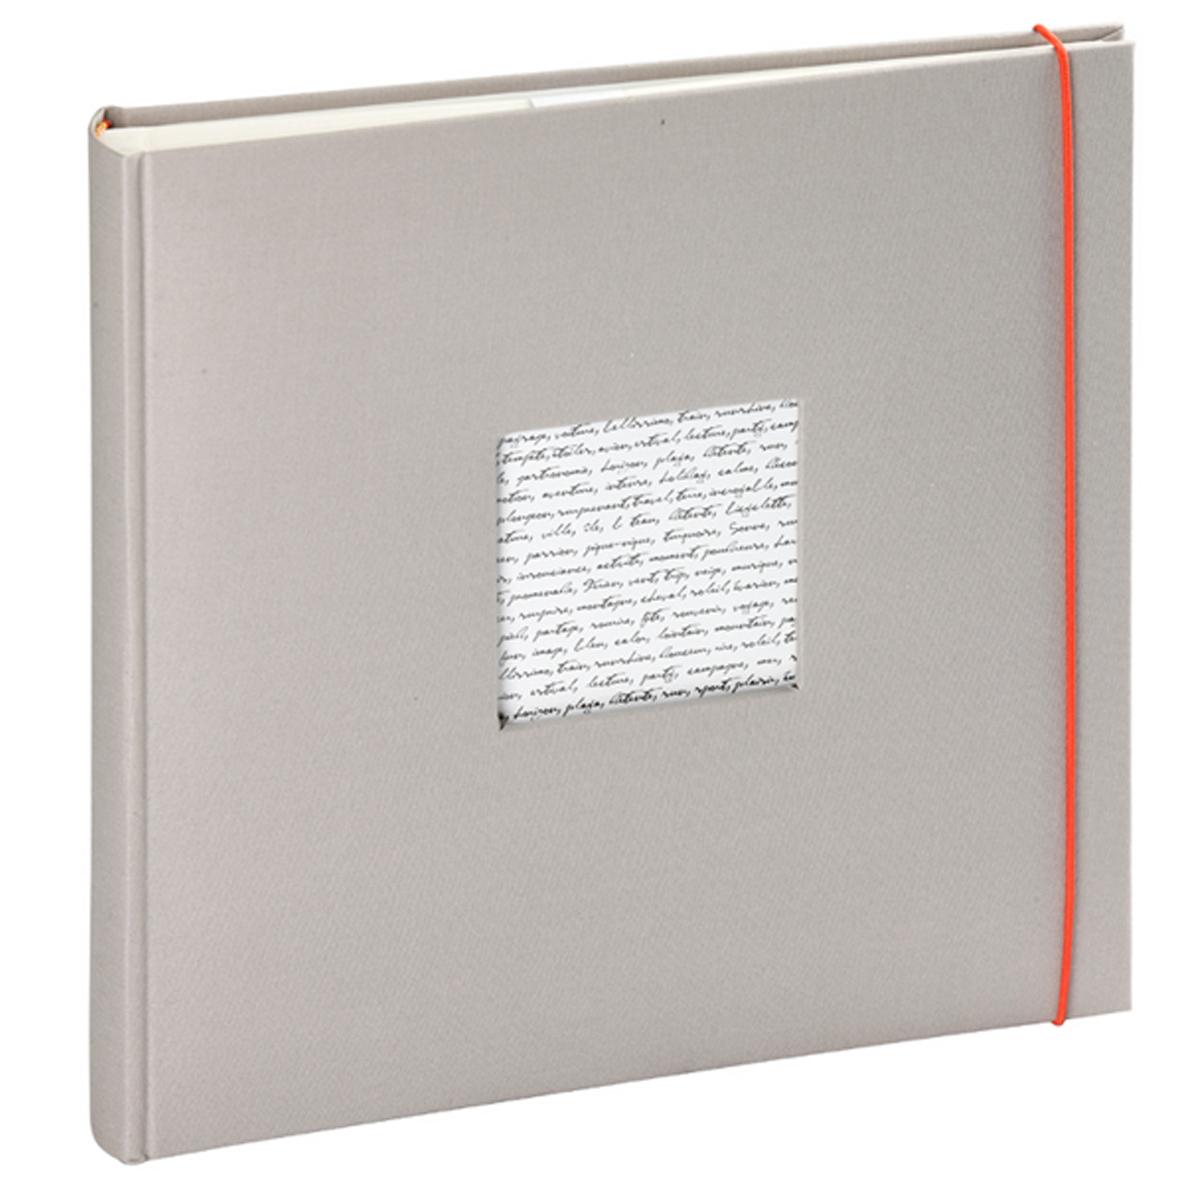 panodia c album artistes tornior 22x22 cm 40 pages new. Black Bedroom Furniture Sets. Home Design Ideas